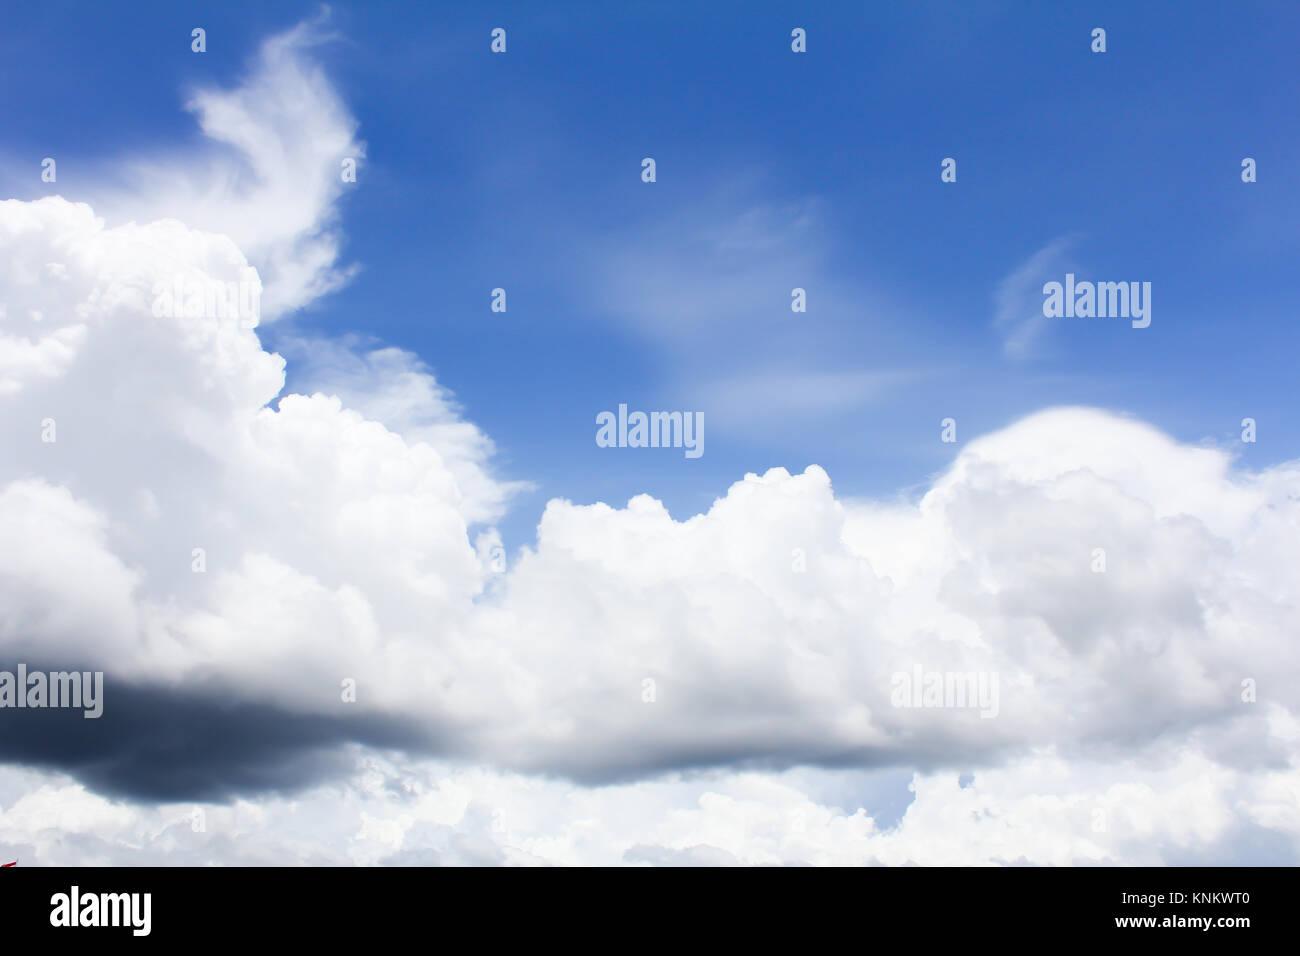 clound on sky - Stock Image